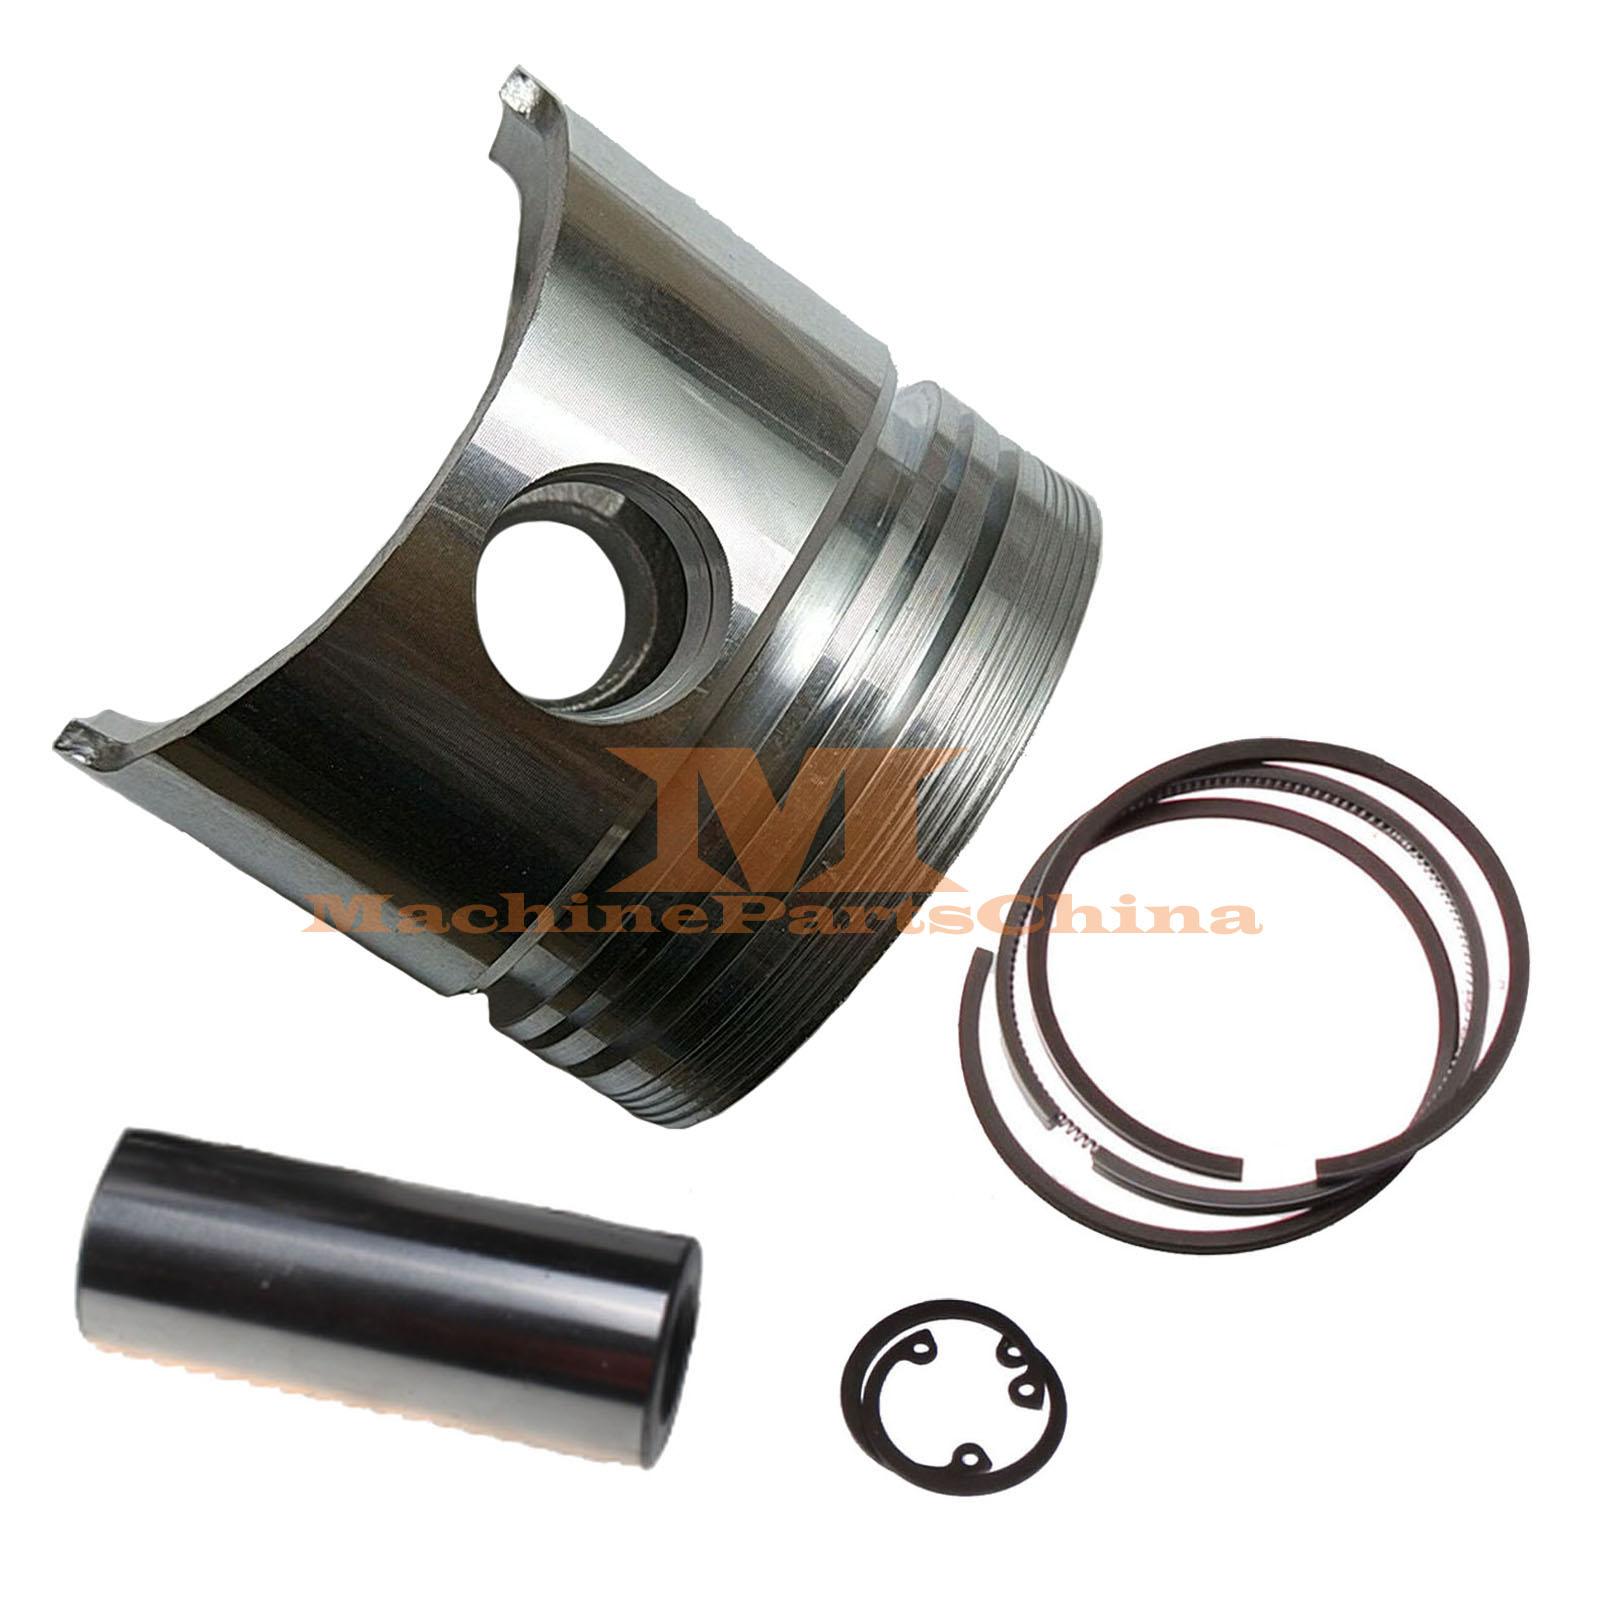 STD Piston /& Rings for Kubota Z751 L2050 M4000 L1501 L2000 B7000 76mm